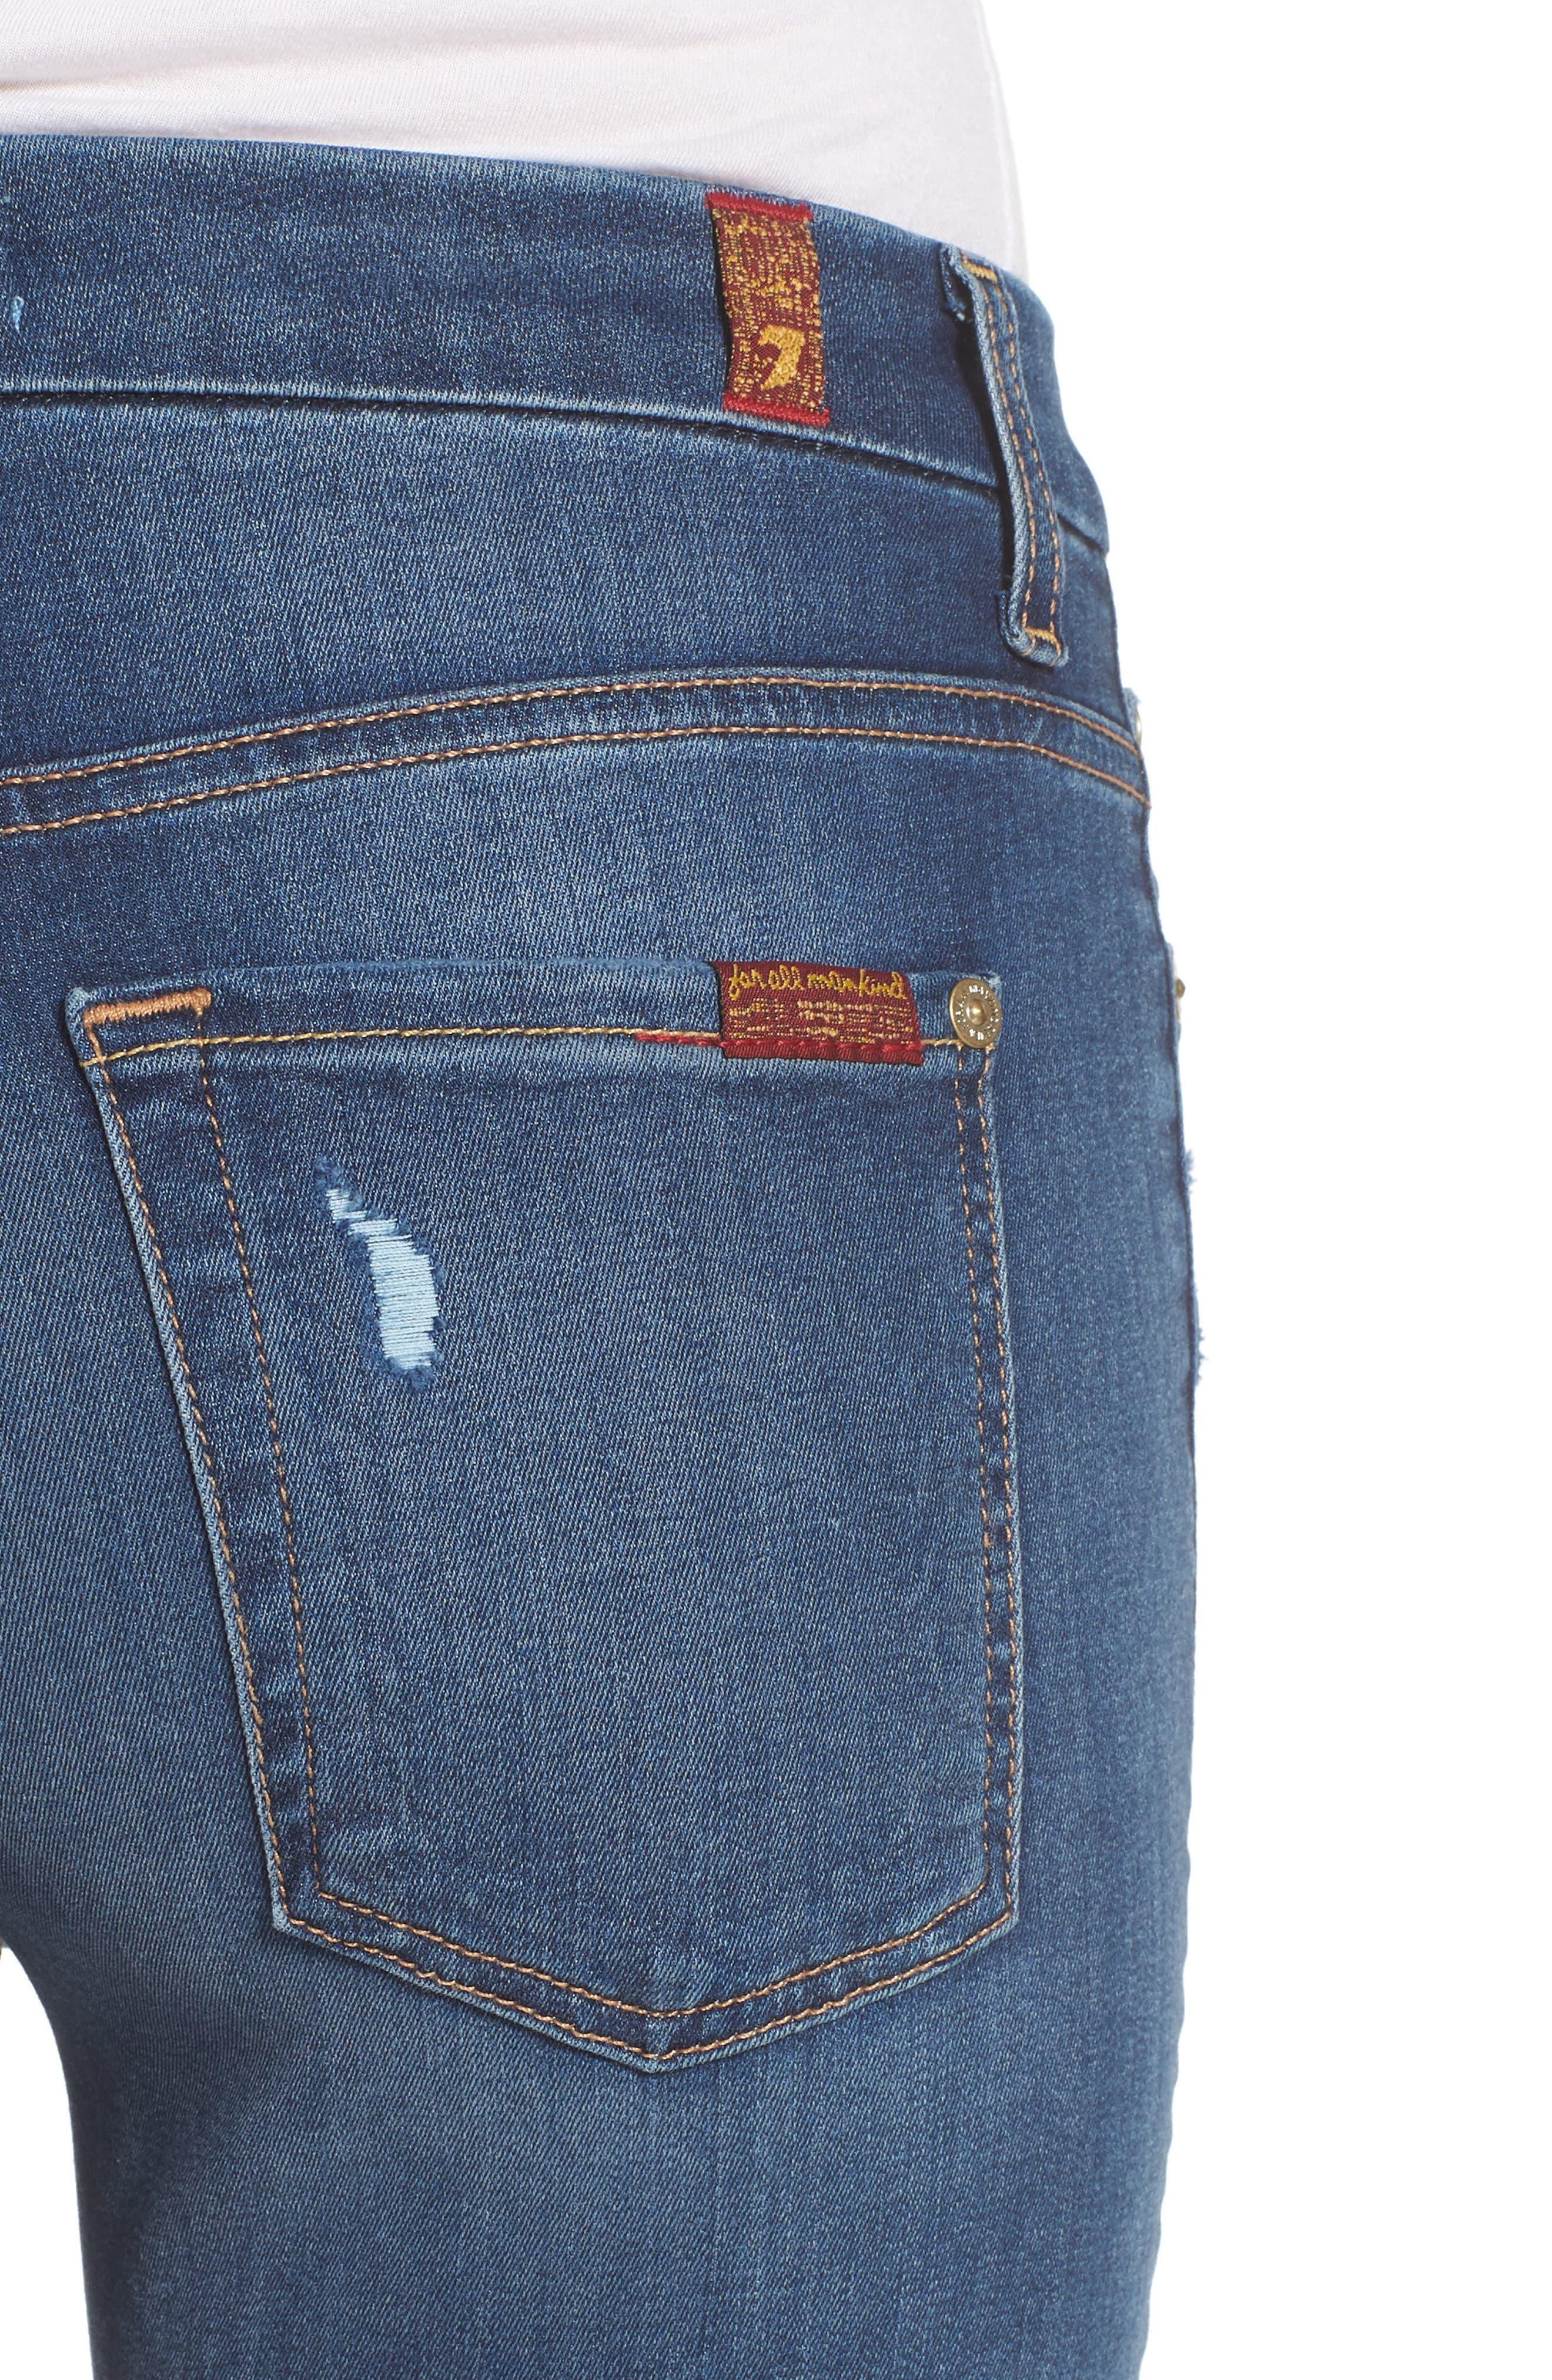 'b(air) - The Ankle' Skinny Jeans,                             Alternate thumbnail 4, color,                             Bair Vintage Dusk 2